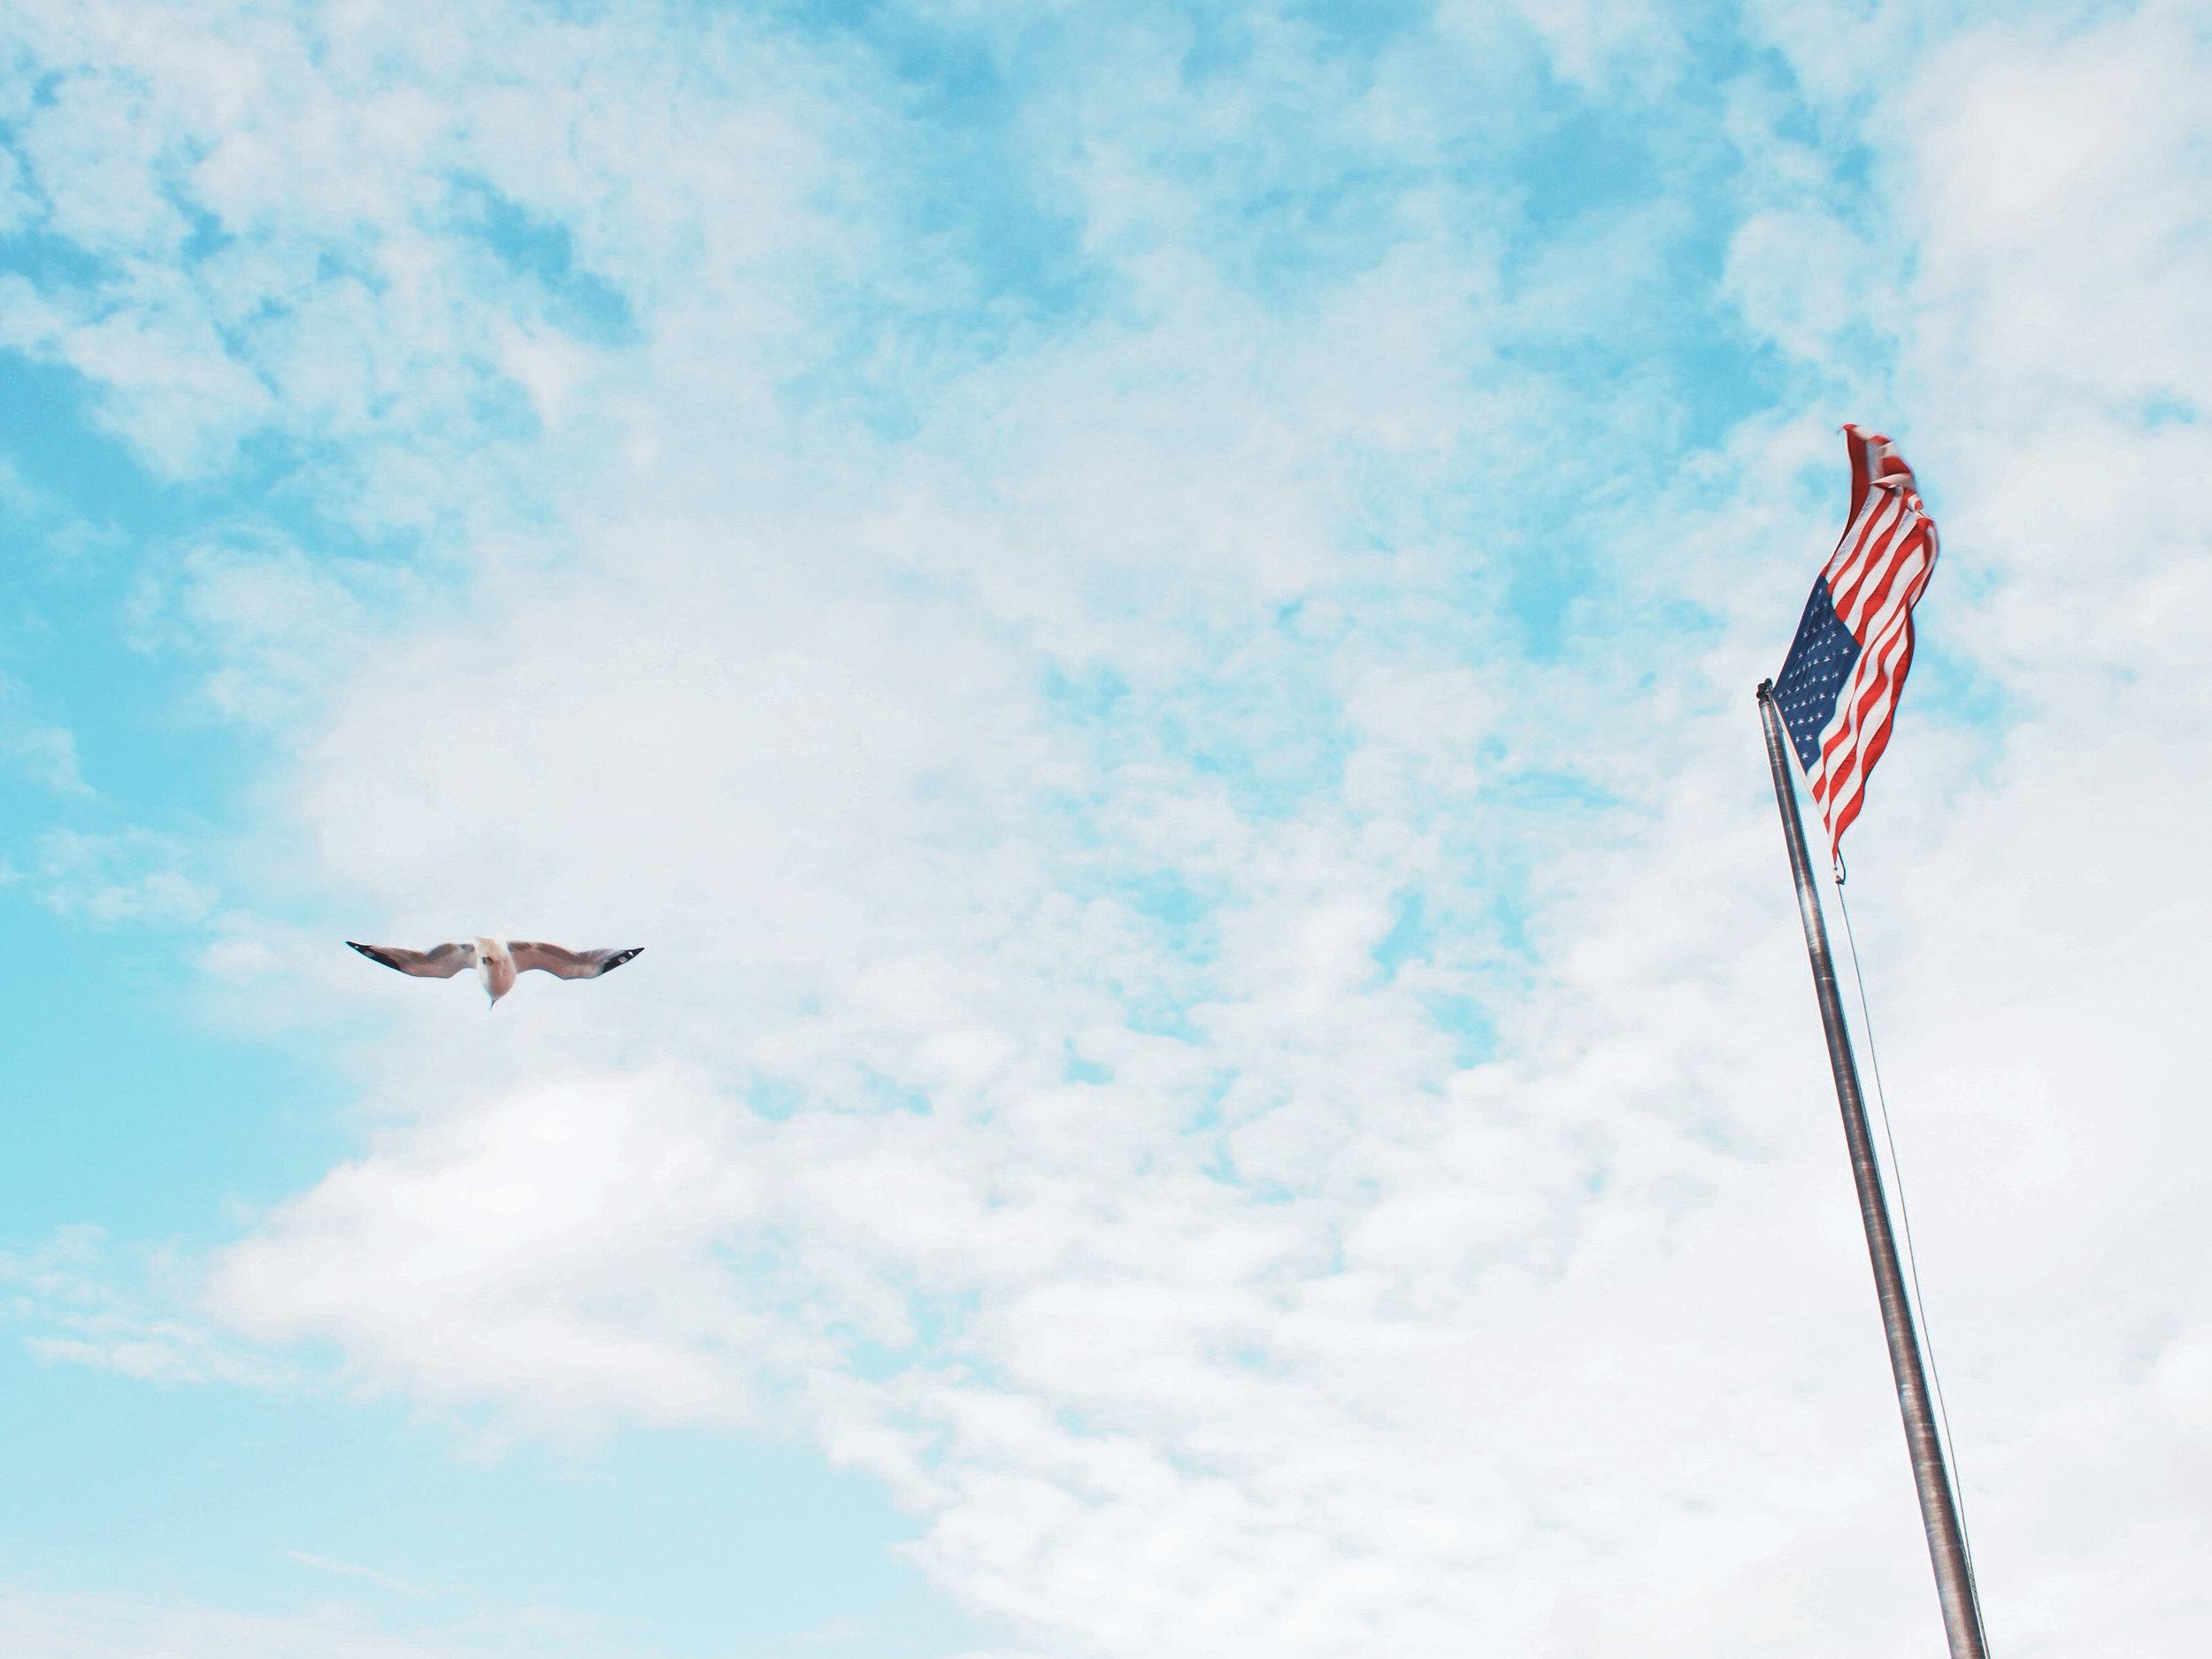 Why teach patriotism?